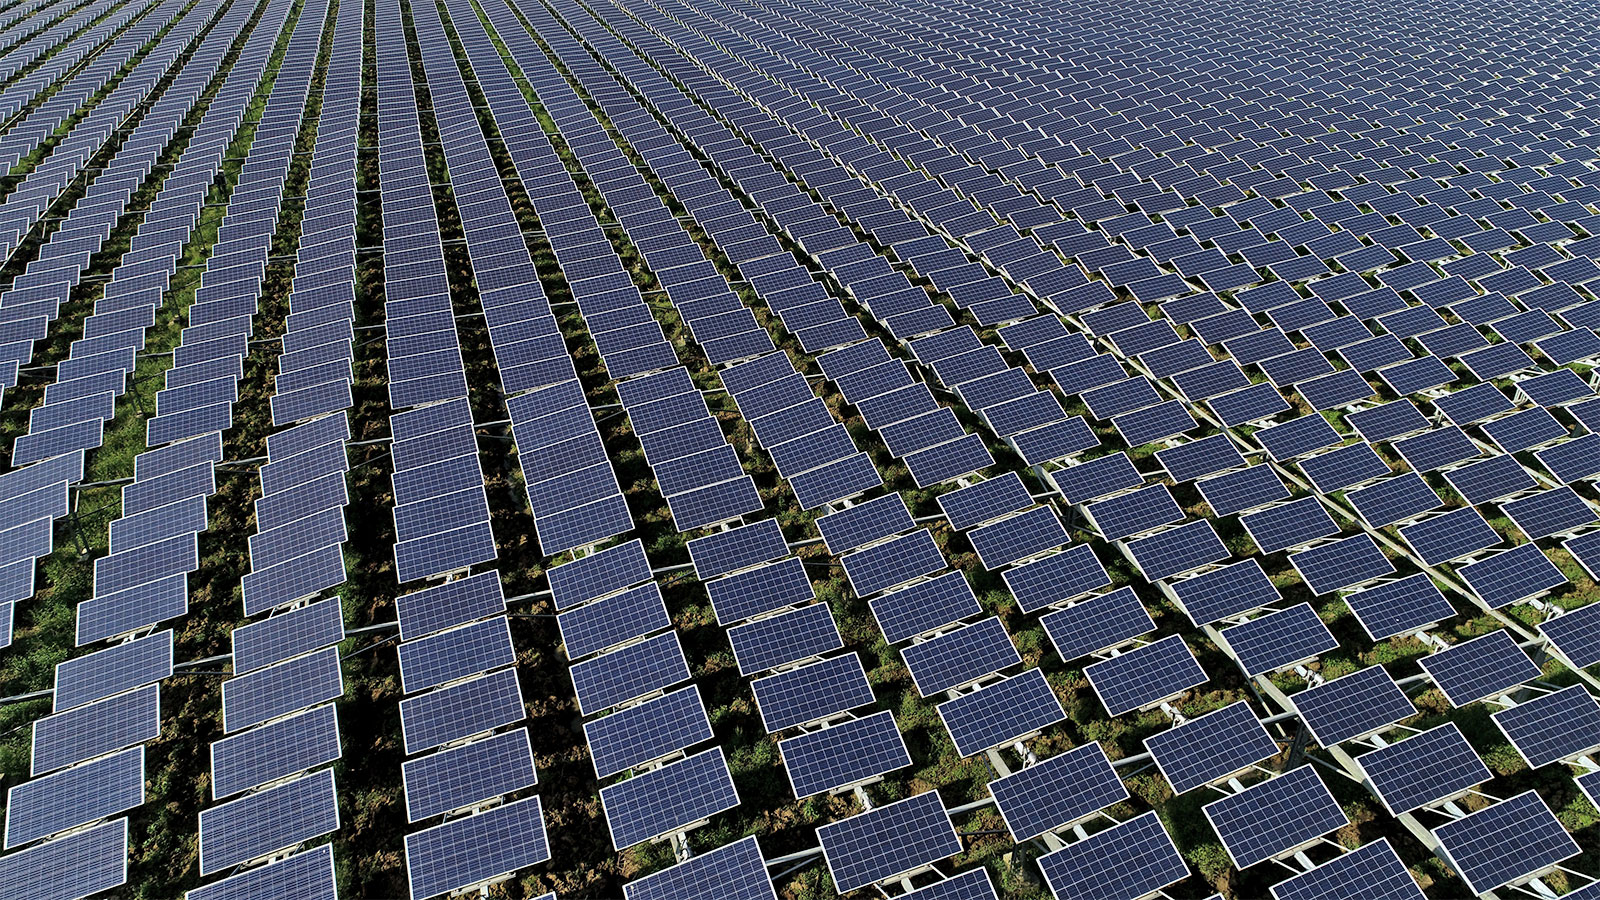 Aerial photo of solar panels